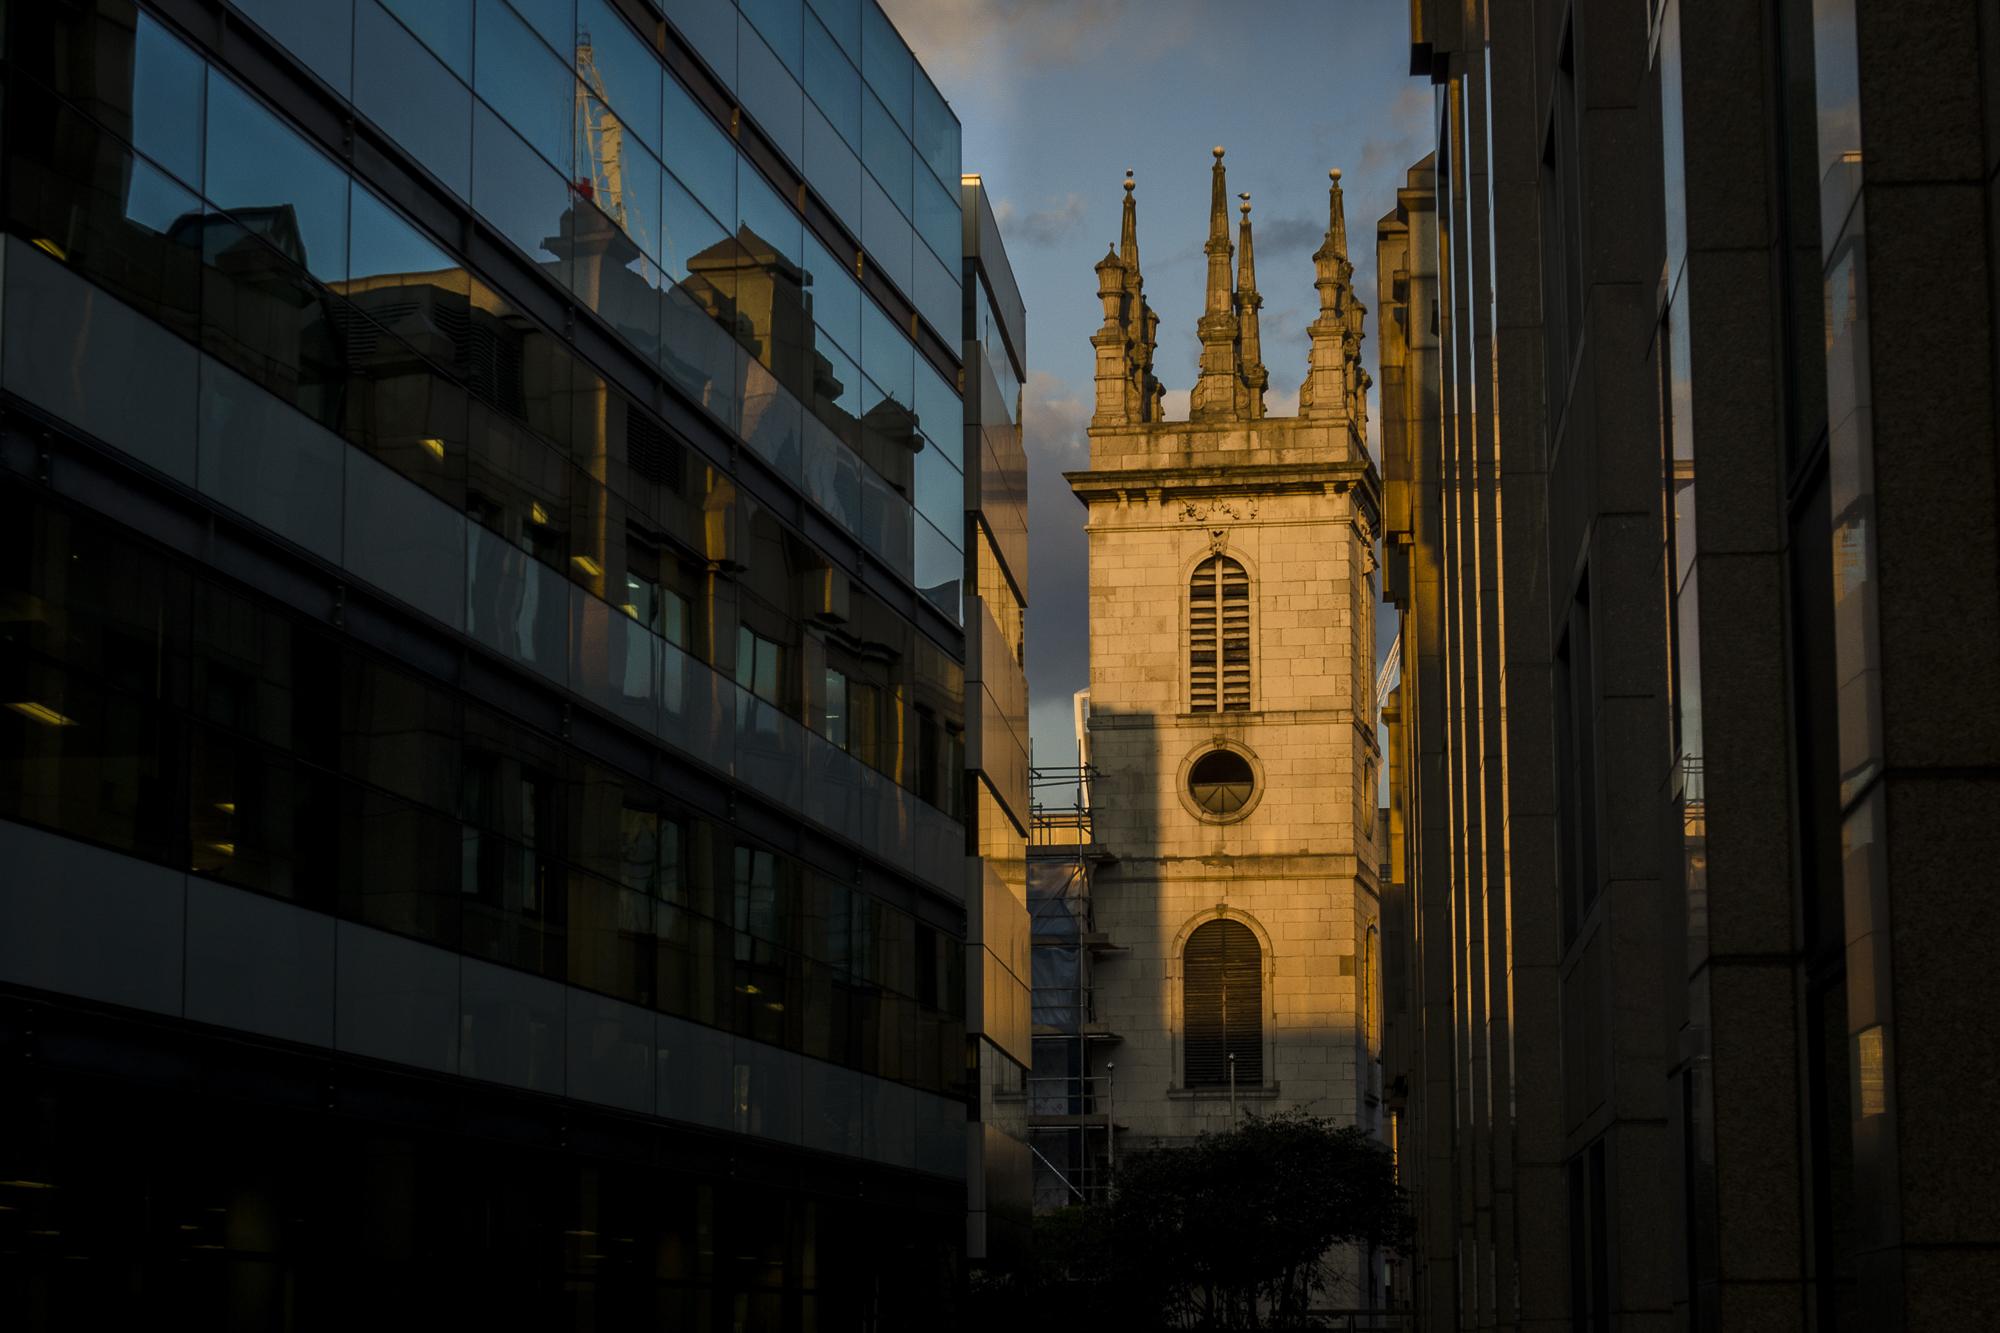 Saint Mary Somerset Tower - London  PHOTOGRAPHY: ALEXANDER J.E. BRADLEY • NIKON D7000 • AF-S NIKKOR 24-70mm ƒ/2.8G ED @ 70MM • ƒ/7.1 • 1/200 • ISO 200